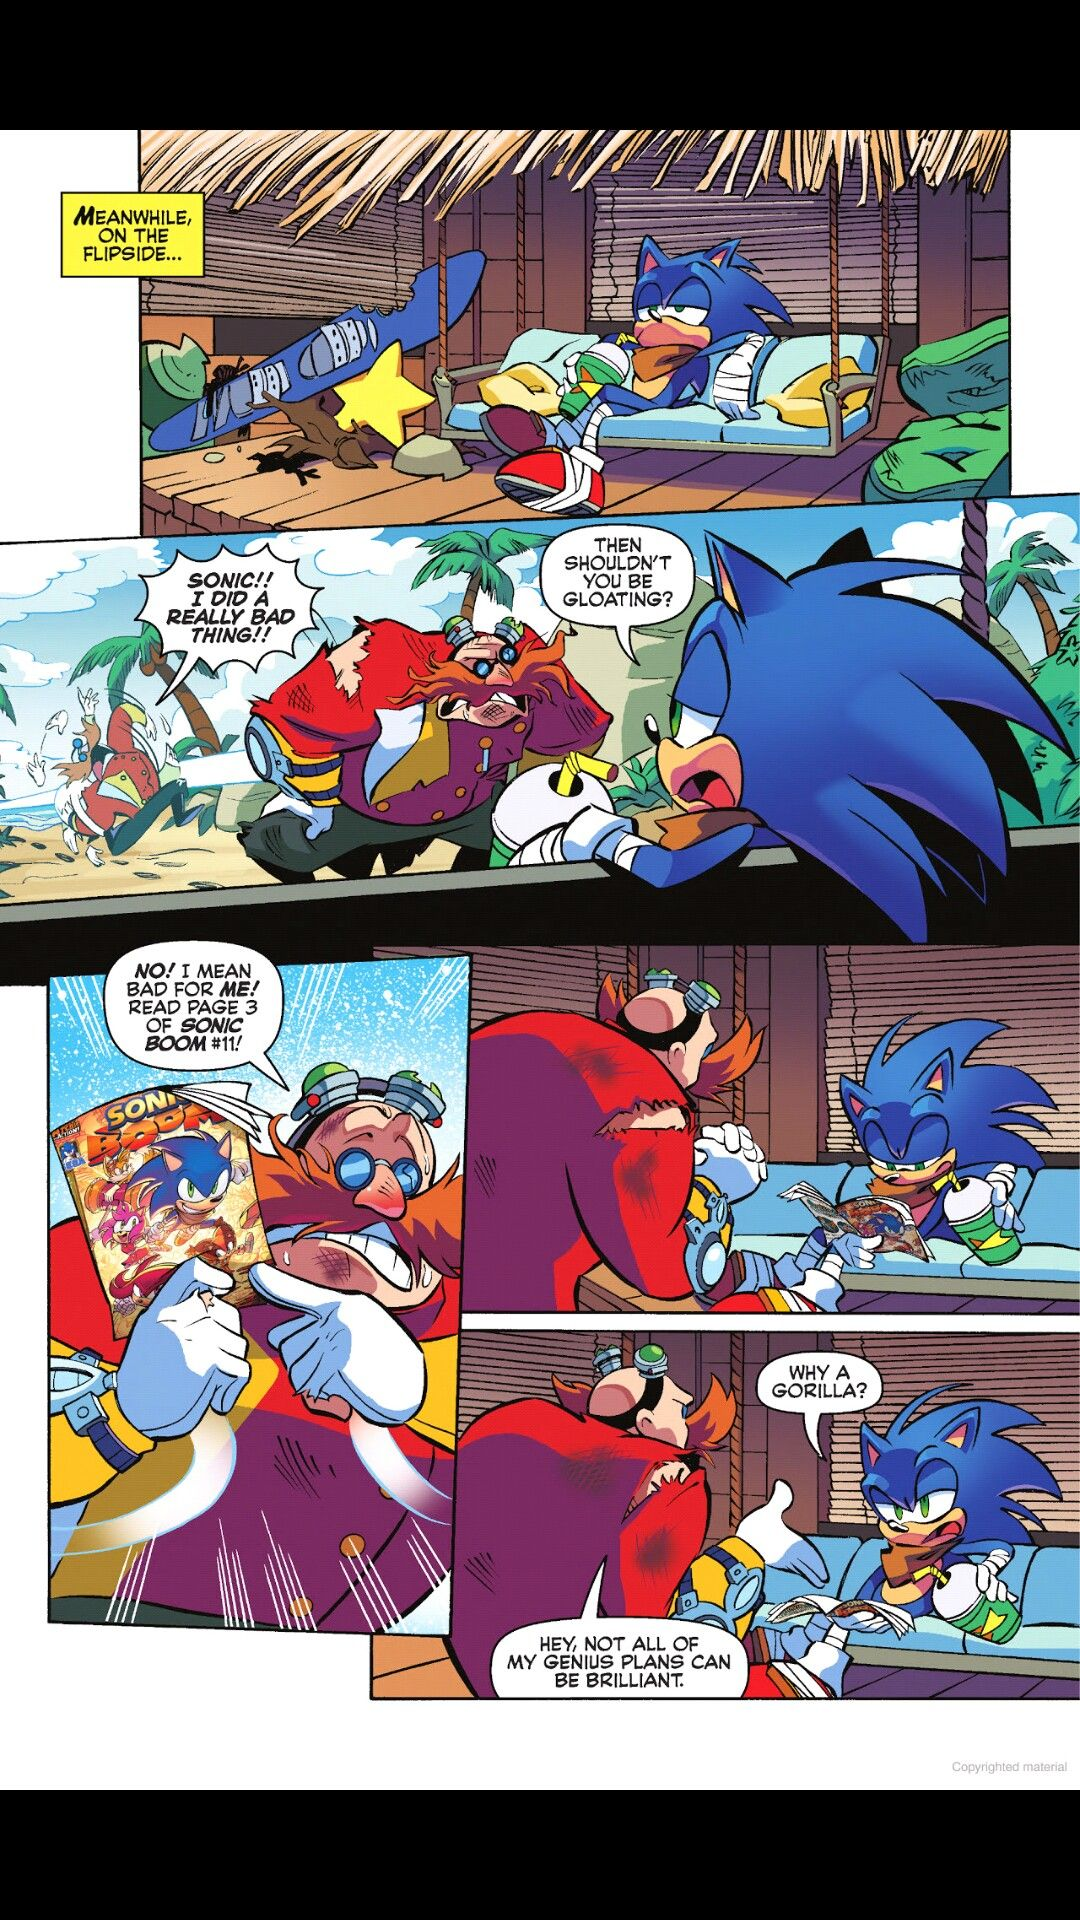 The Sonic S Comic In Sonic S Comic Wtf Sonic Boom Sonic Funny Sonic Nintendo